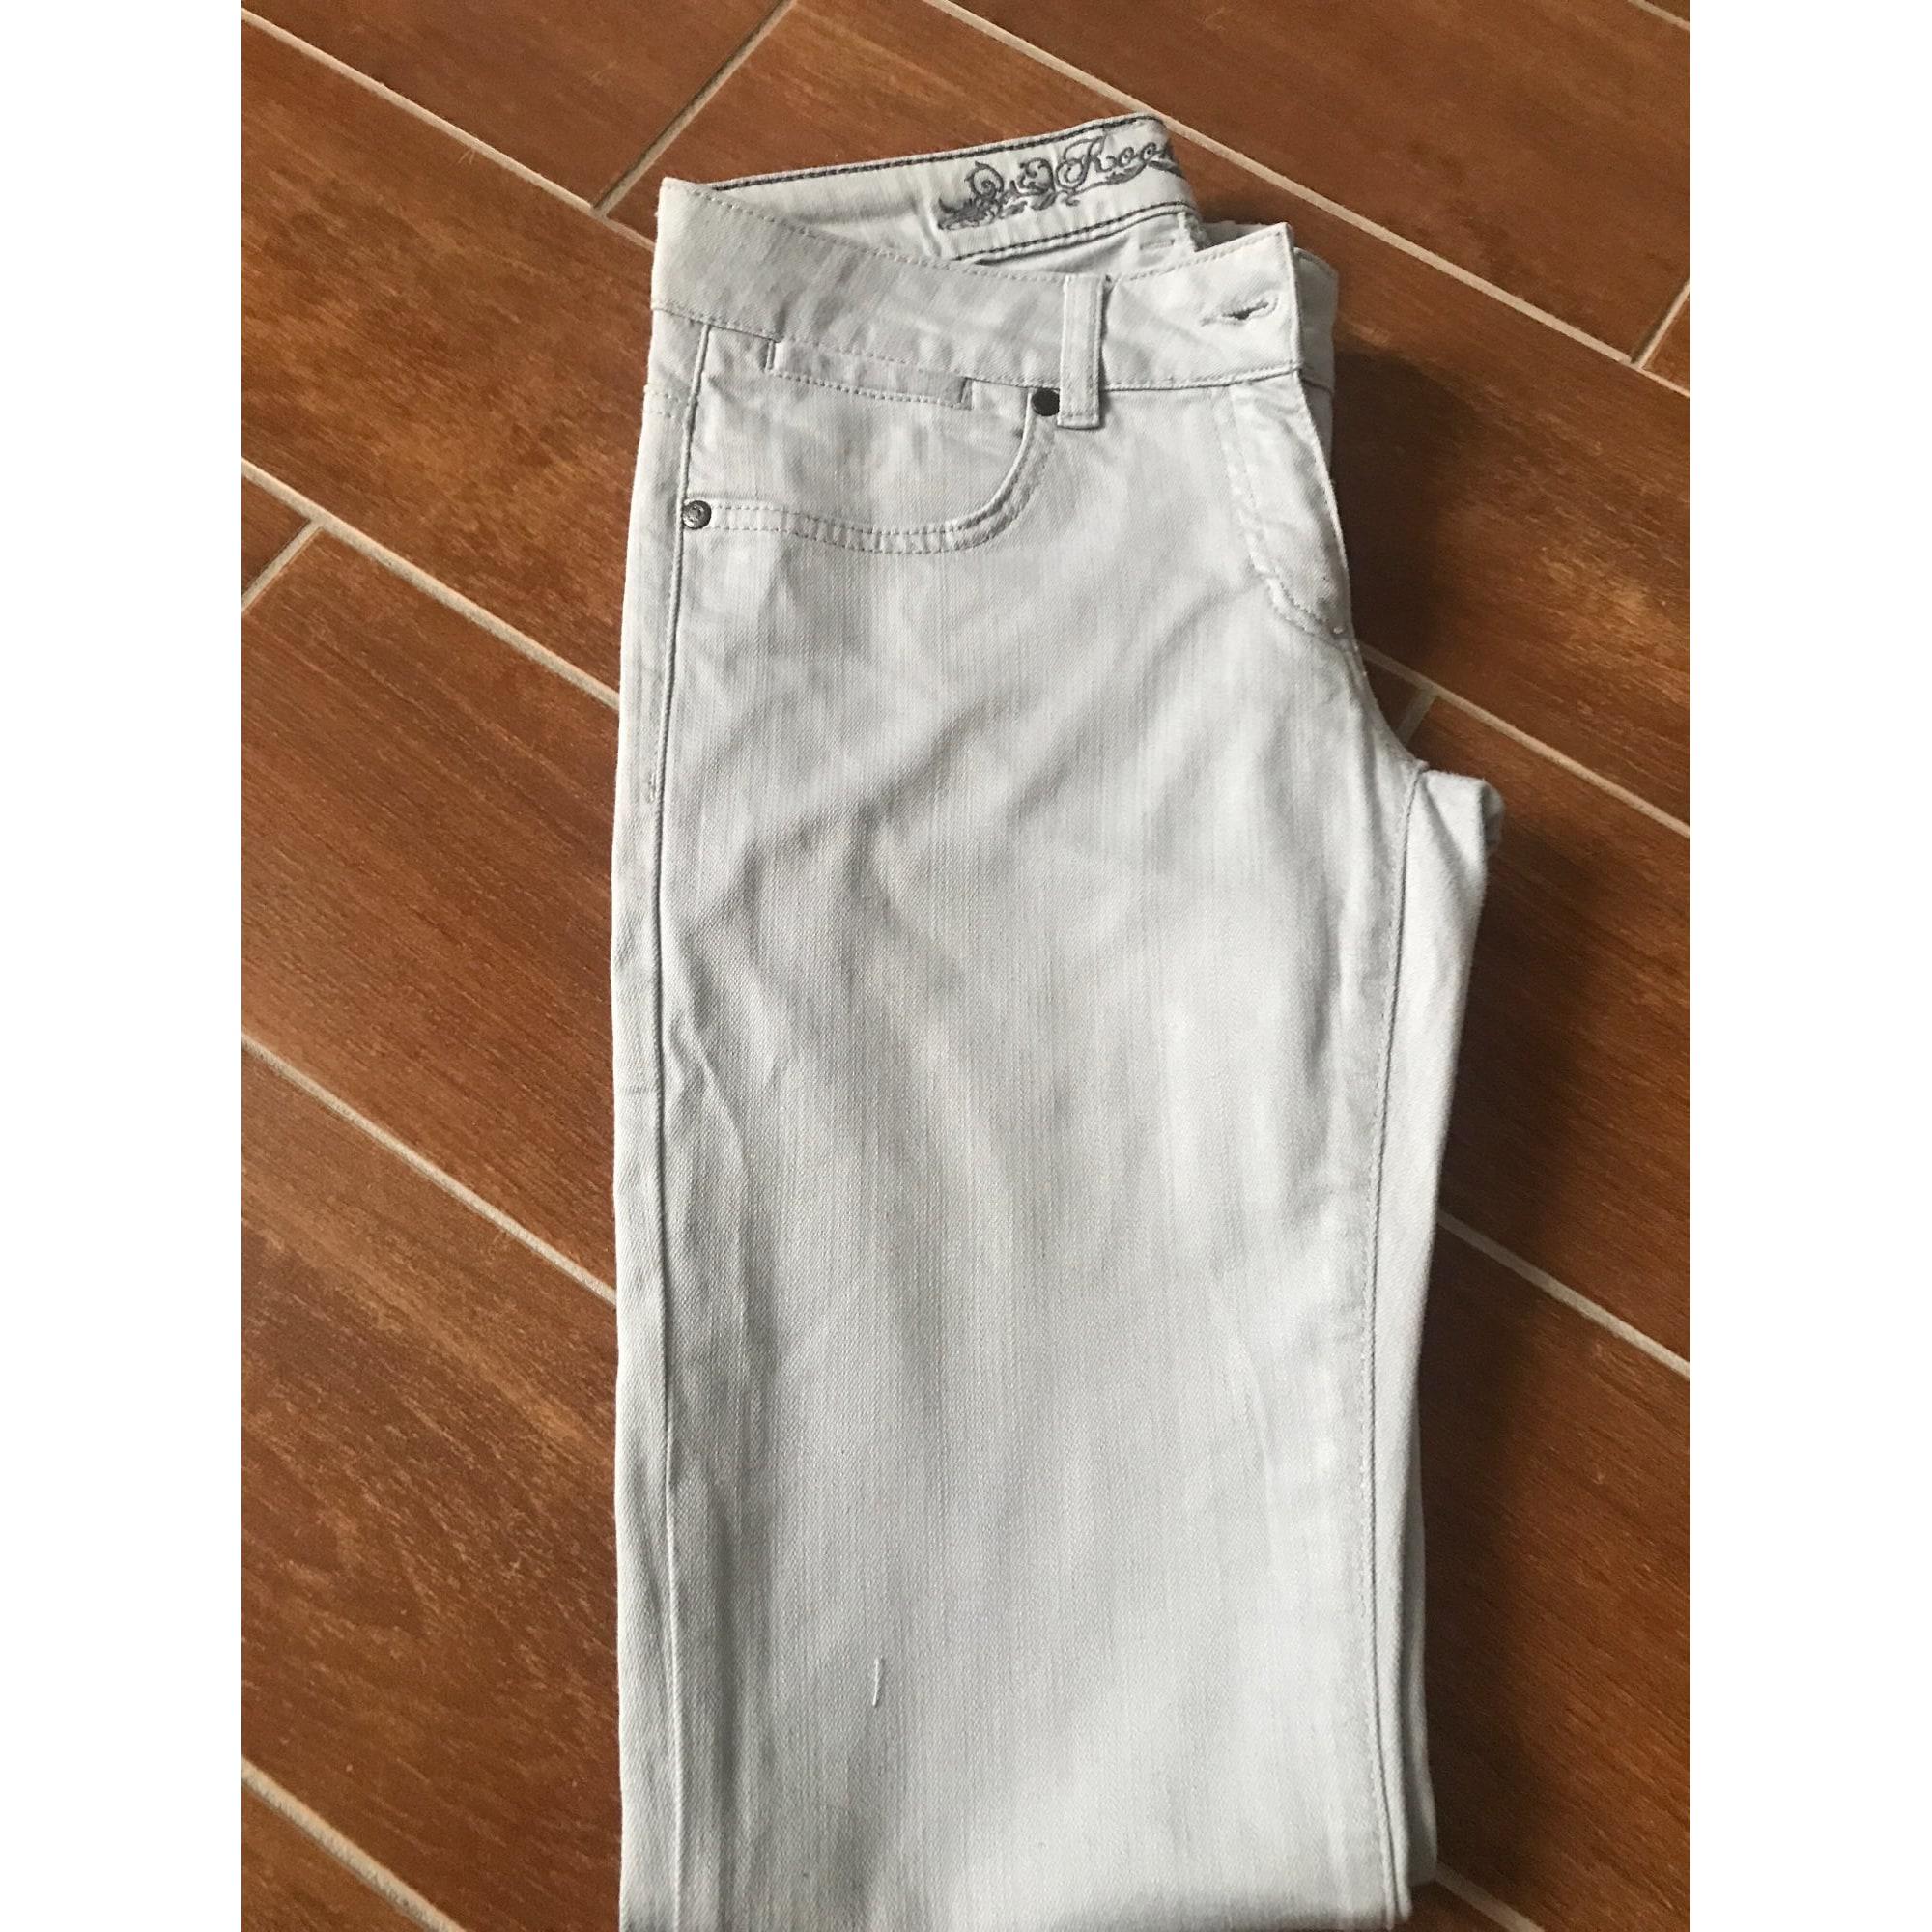 Jeans slim KOOKAI Gris, anthracite